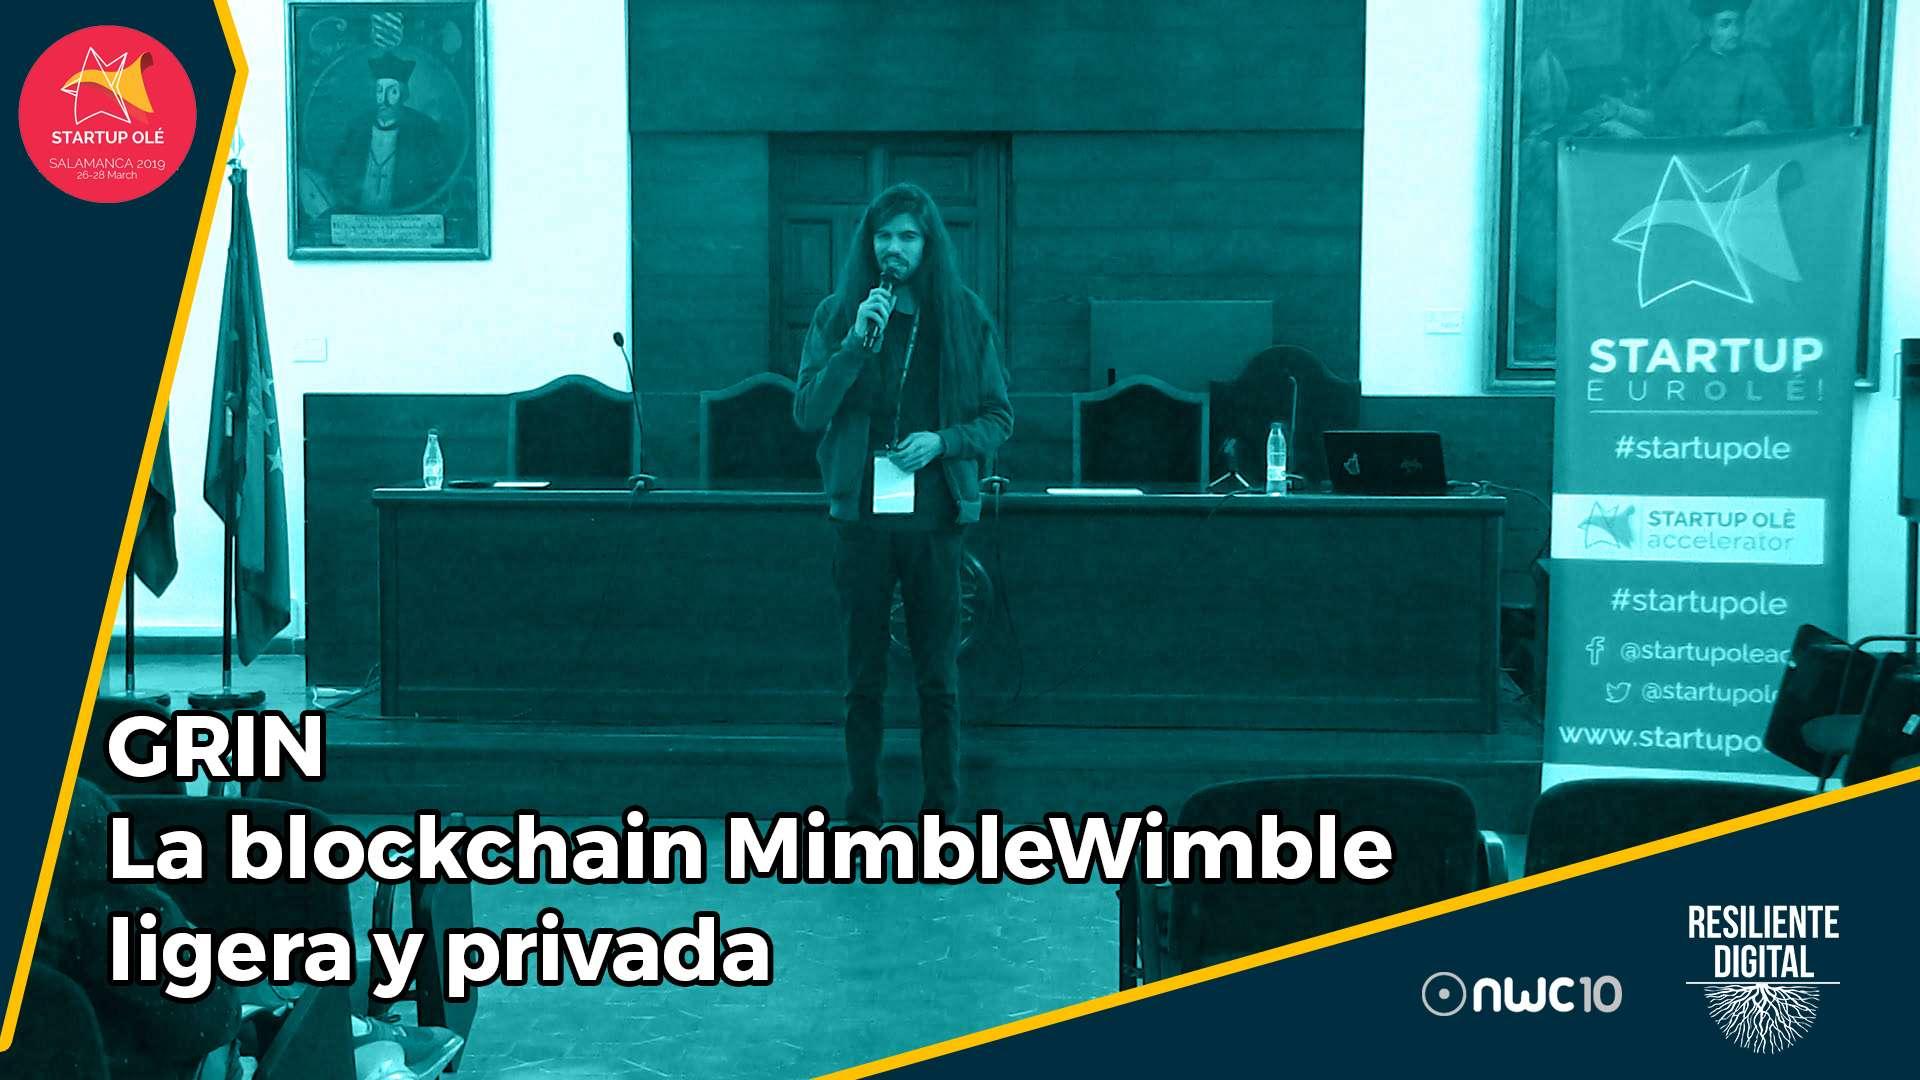 GRIN. La blockchain MimbreWimble ligera y privada.